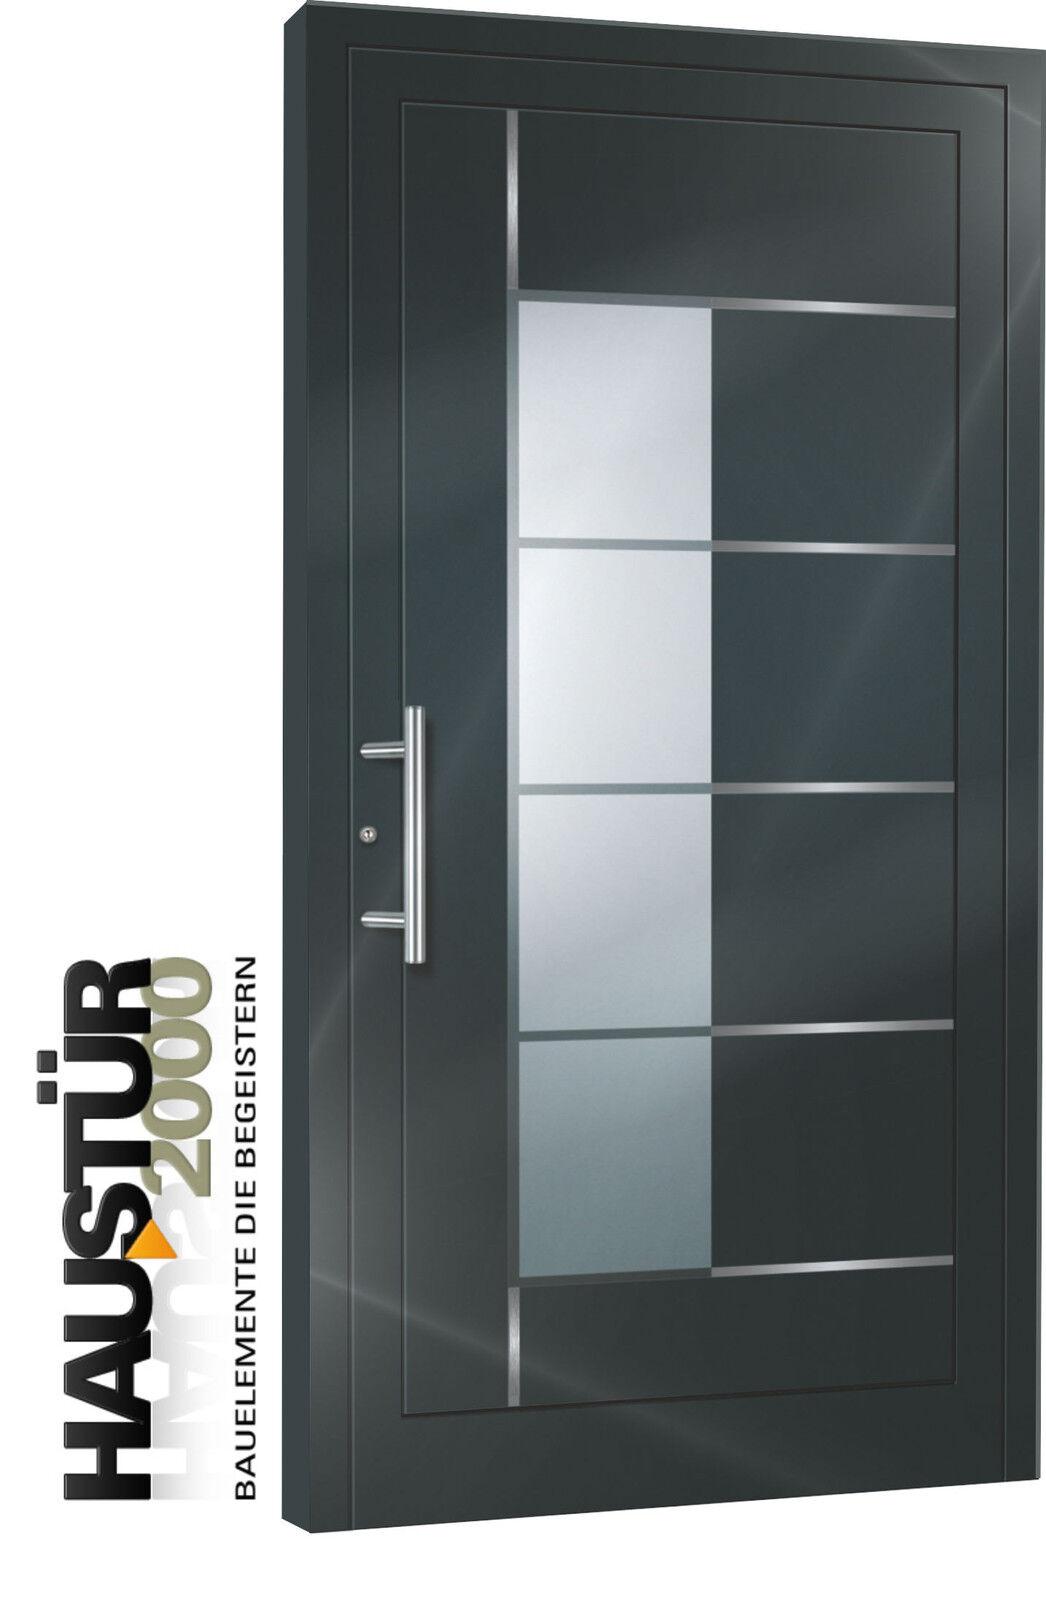 Aluminium Haustür Alu Haustüren nach Maß Mod. HT 5332 - 726  GA nach Maß